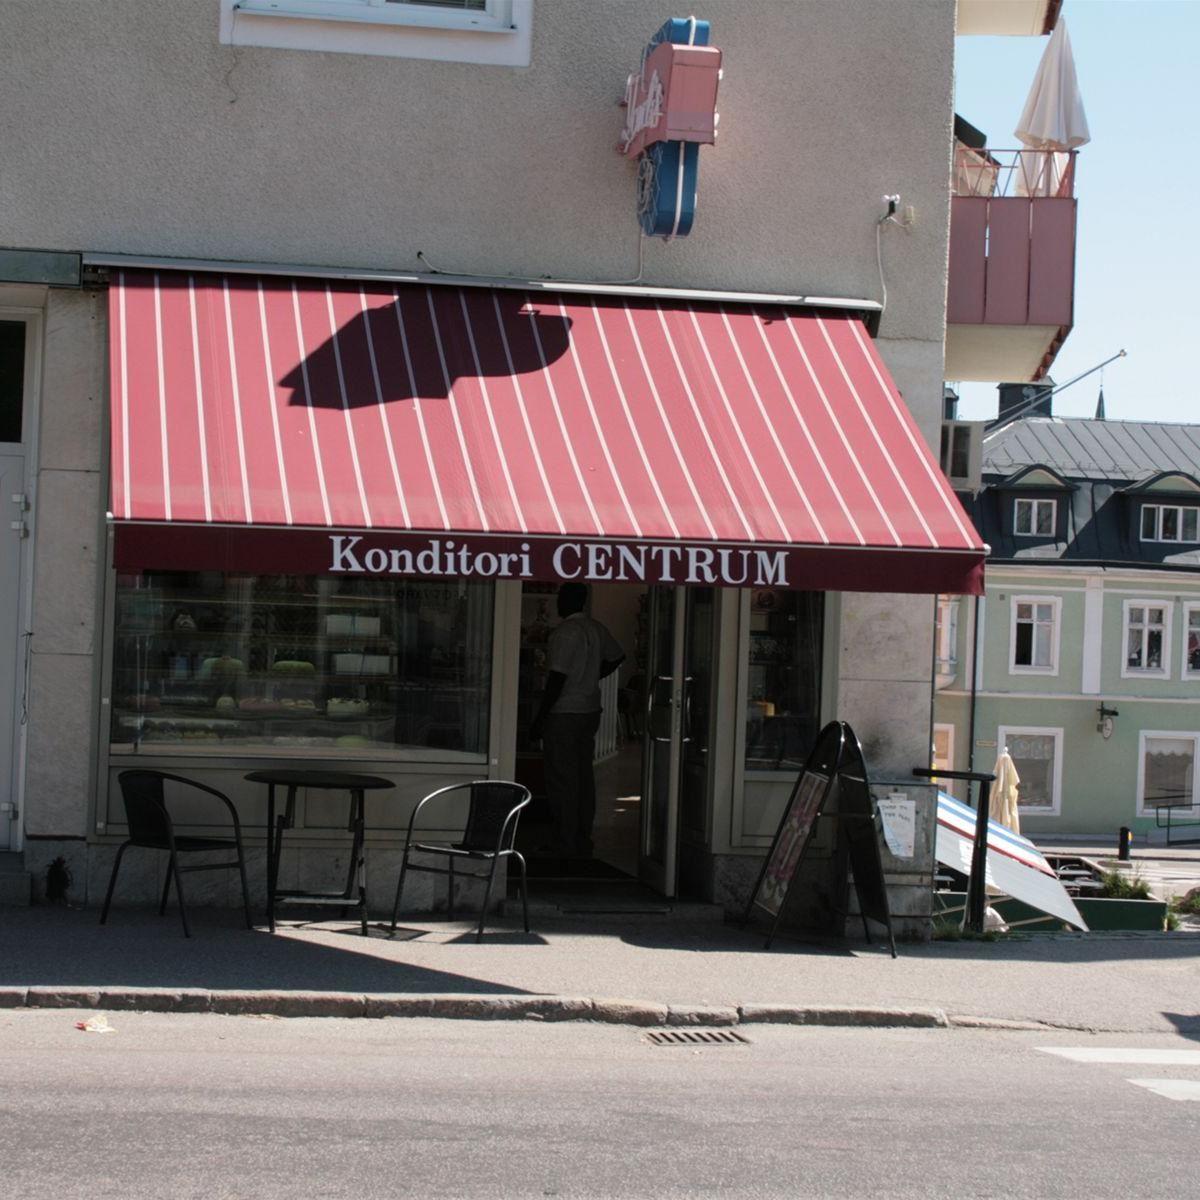 Konditori Centrum